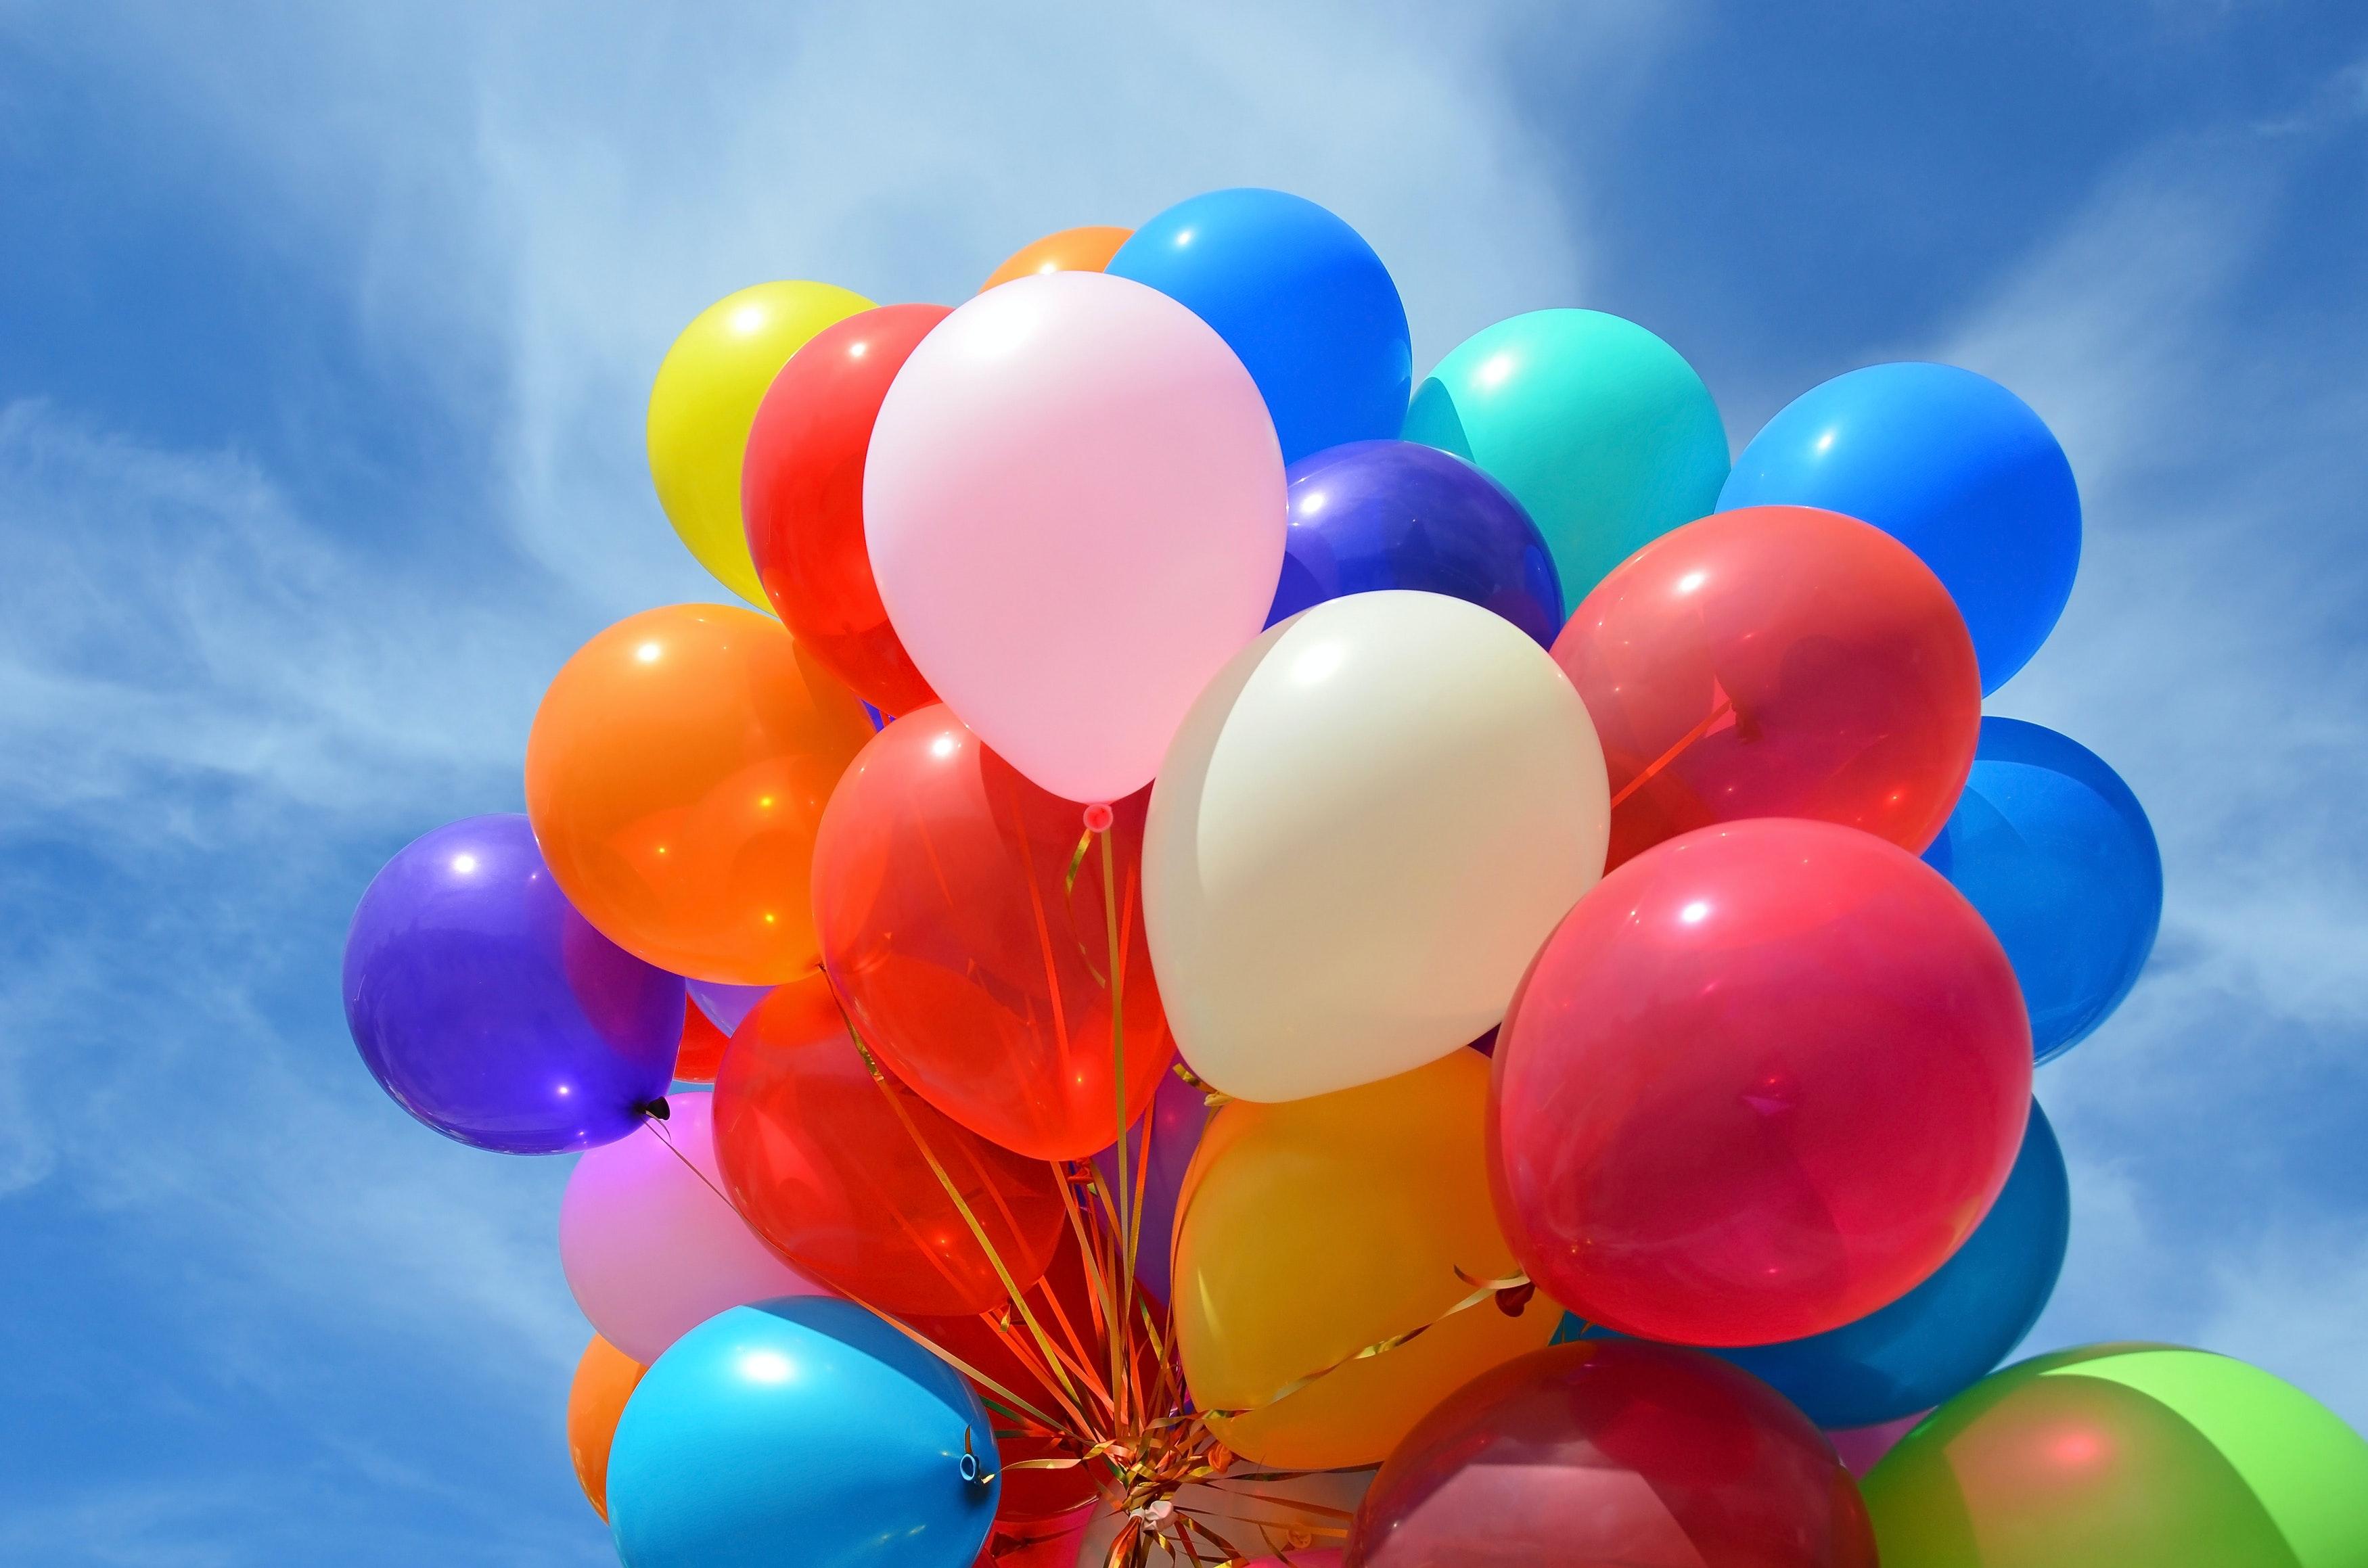 Det periodiske system helium ballon